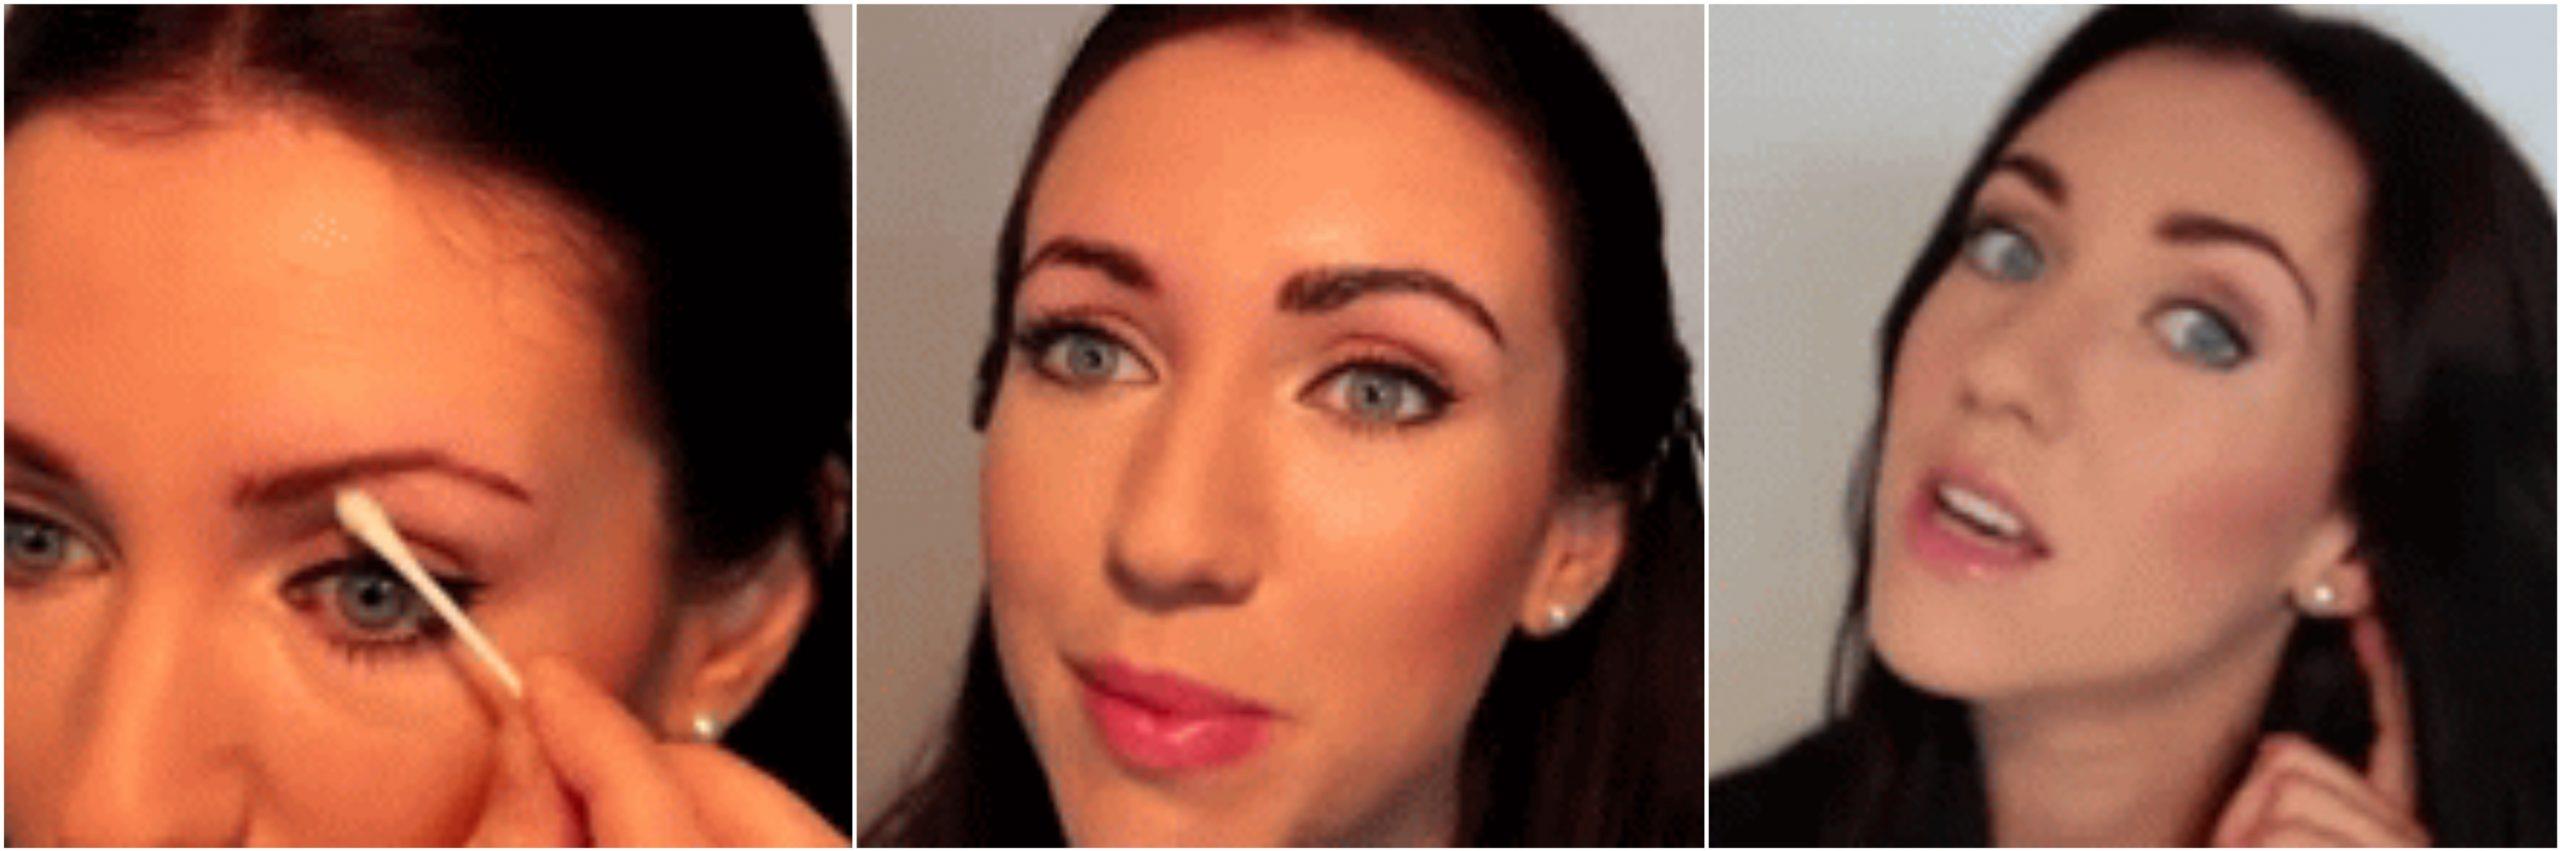 How to darken eyebrows at home ?